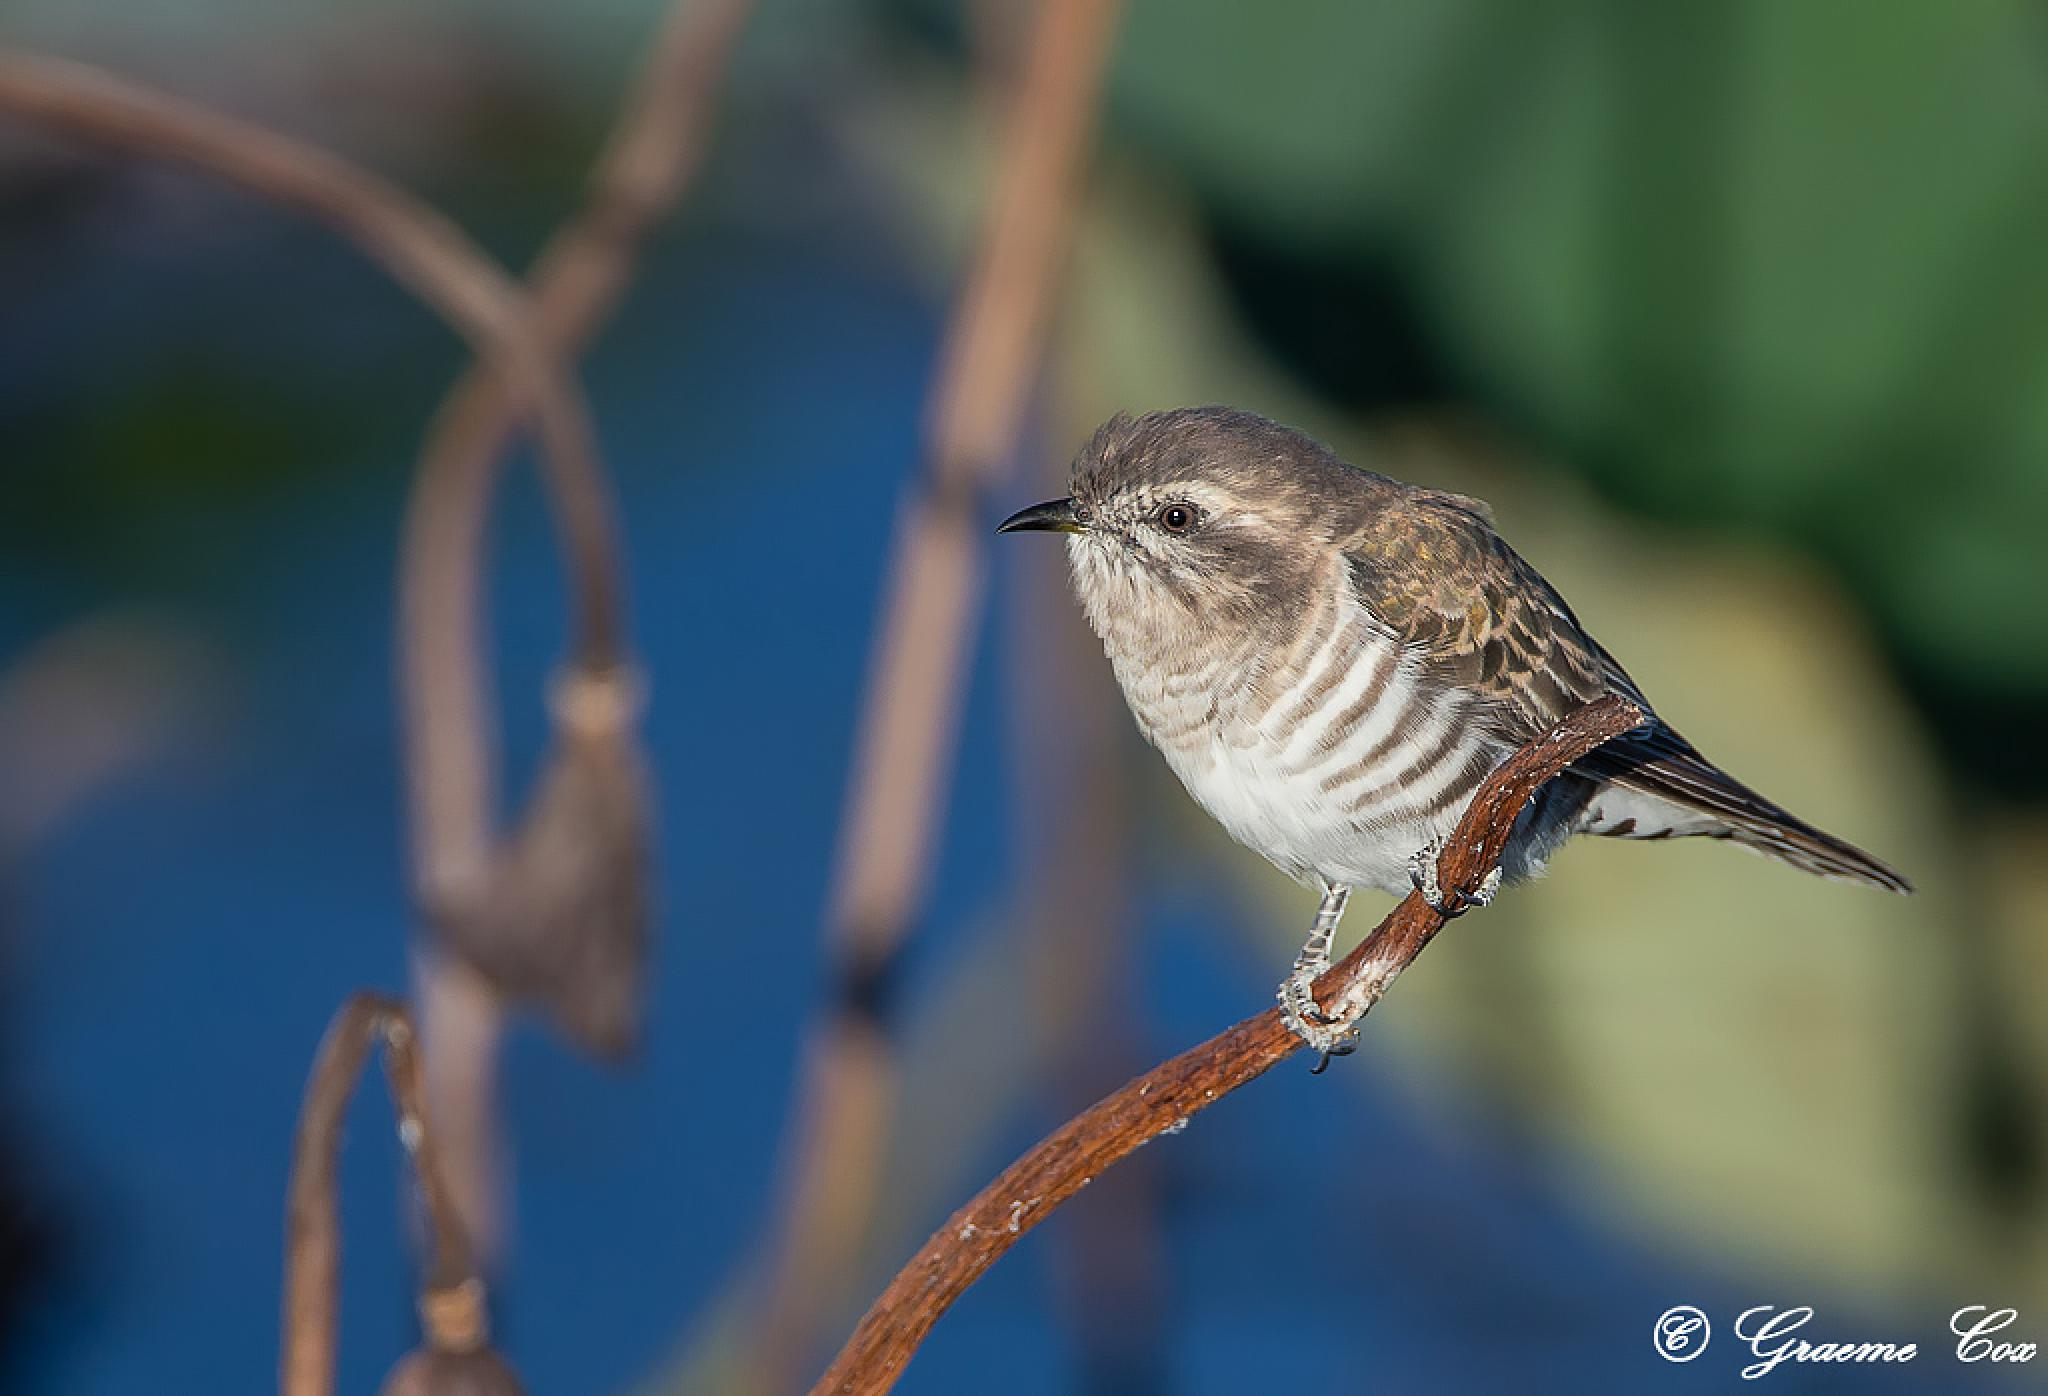 Horsfield's  cuckoo by Graeme Cox